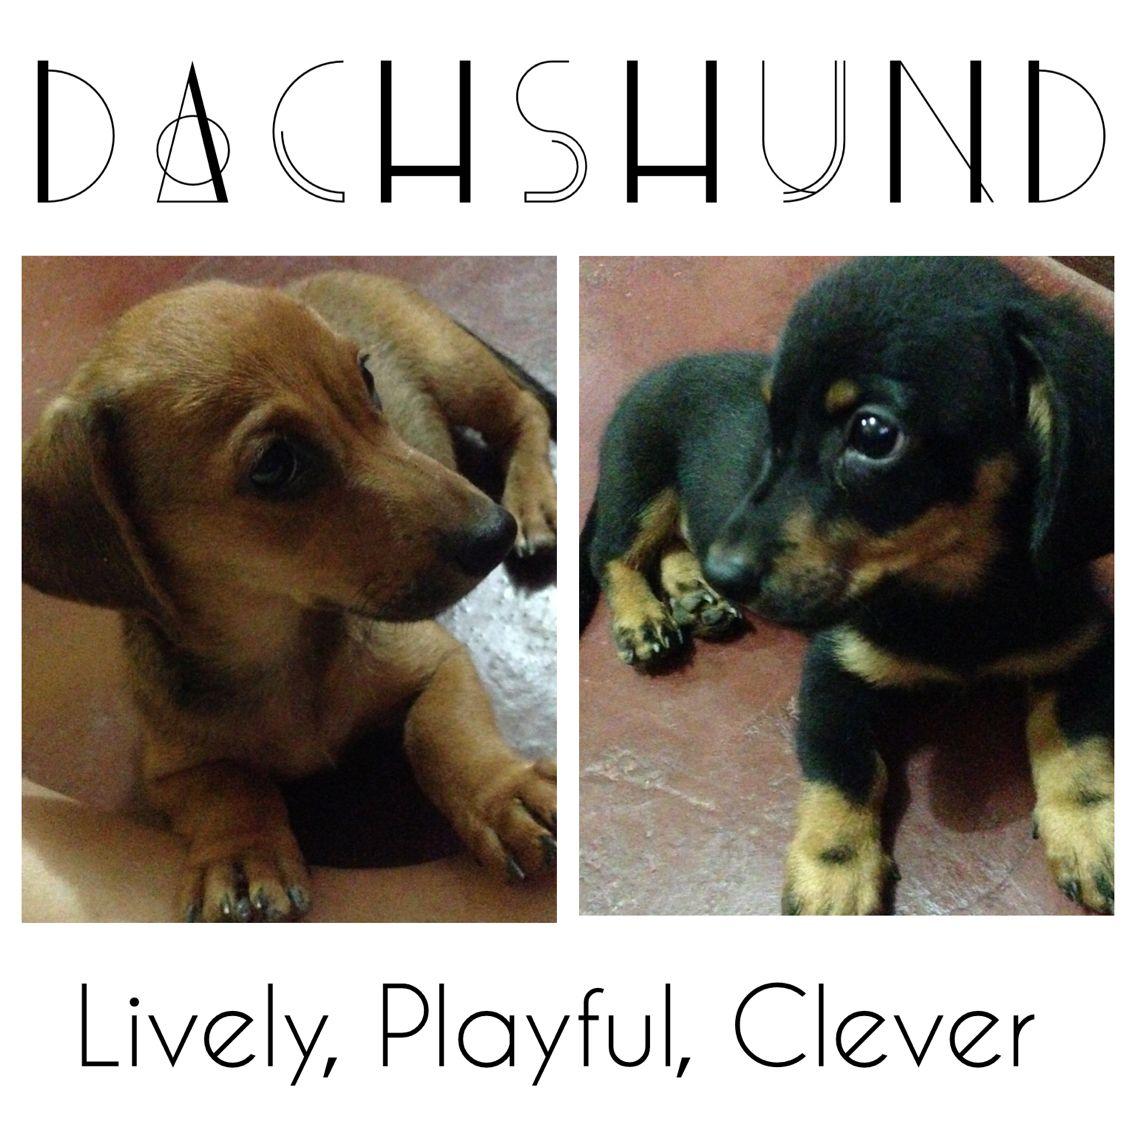 For Sale Dachshund Puppies Message Us At Www Fb Com Katrinasclothingshop Shoppingph Onlineshoppingph Labrador Puppy Training Labrador Puppy Smart Dog